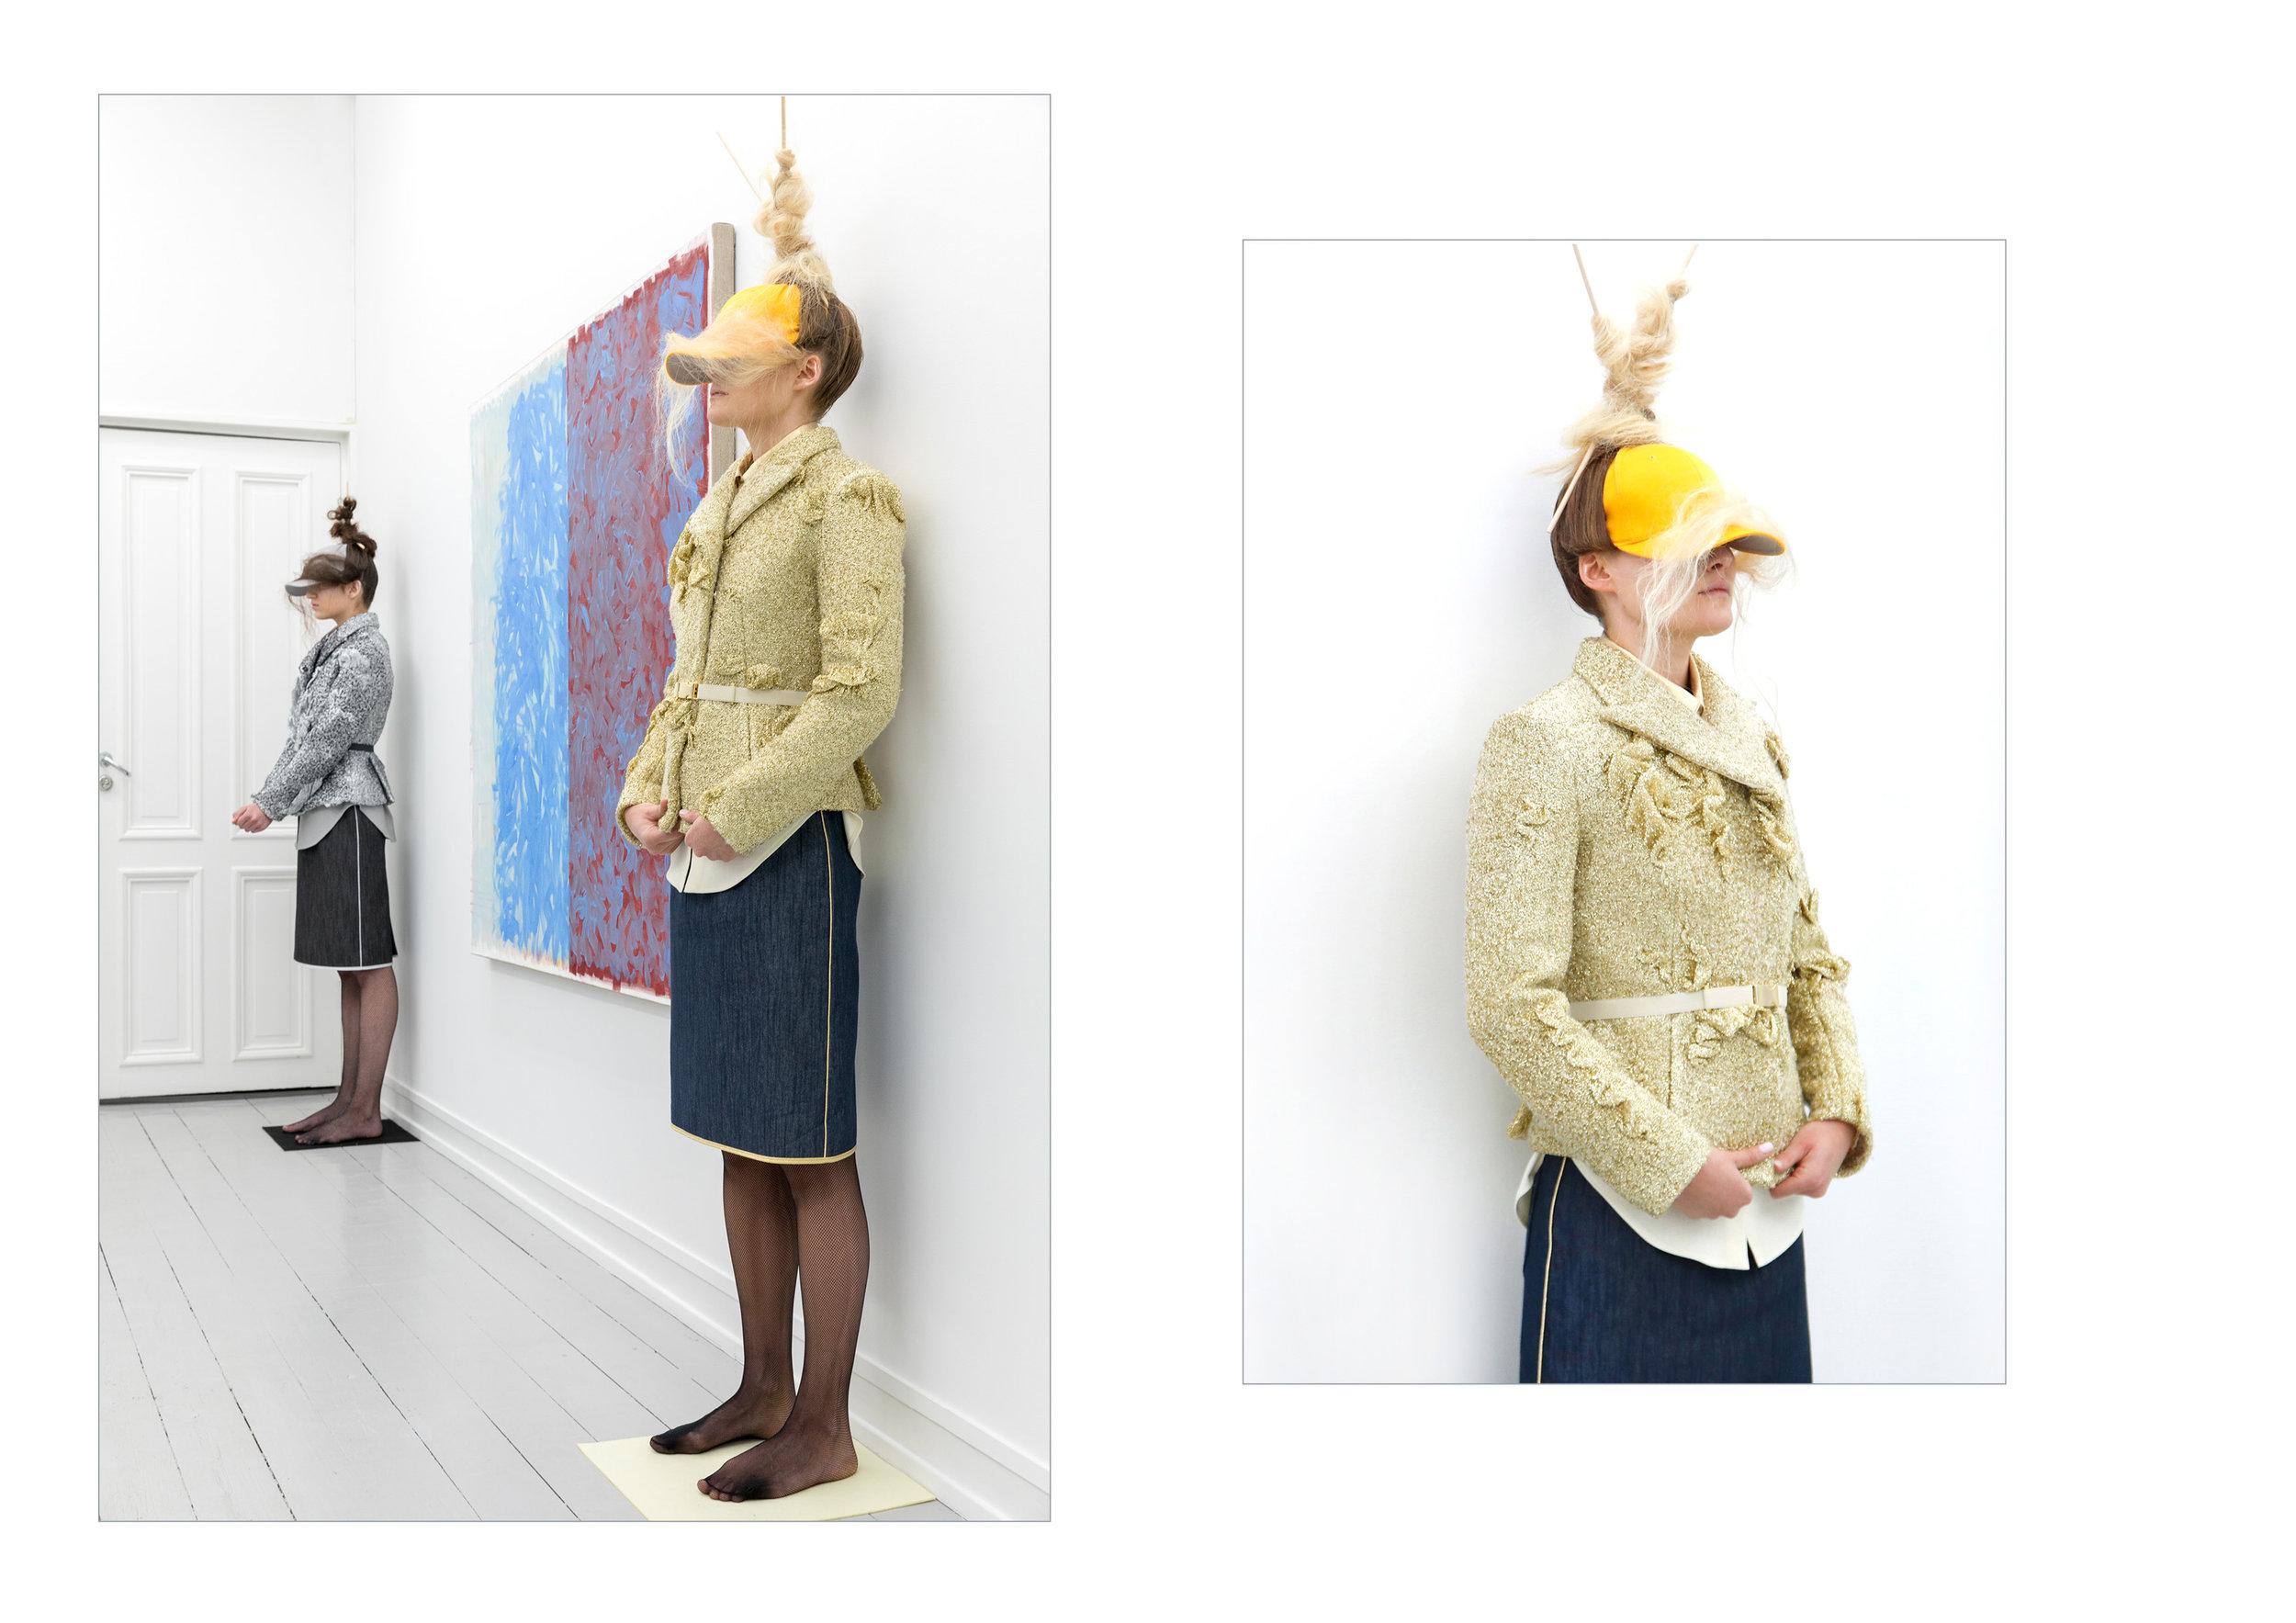 Photo: Left: Adrian Bugge / Right: Indigital Images